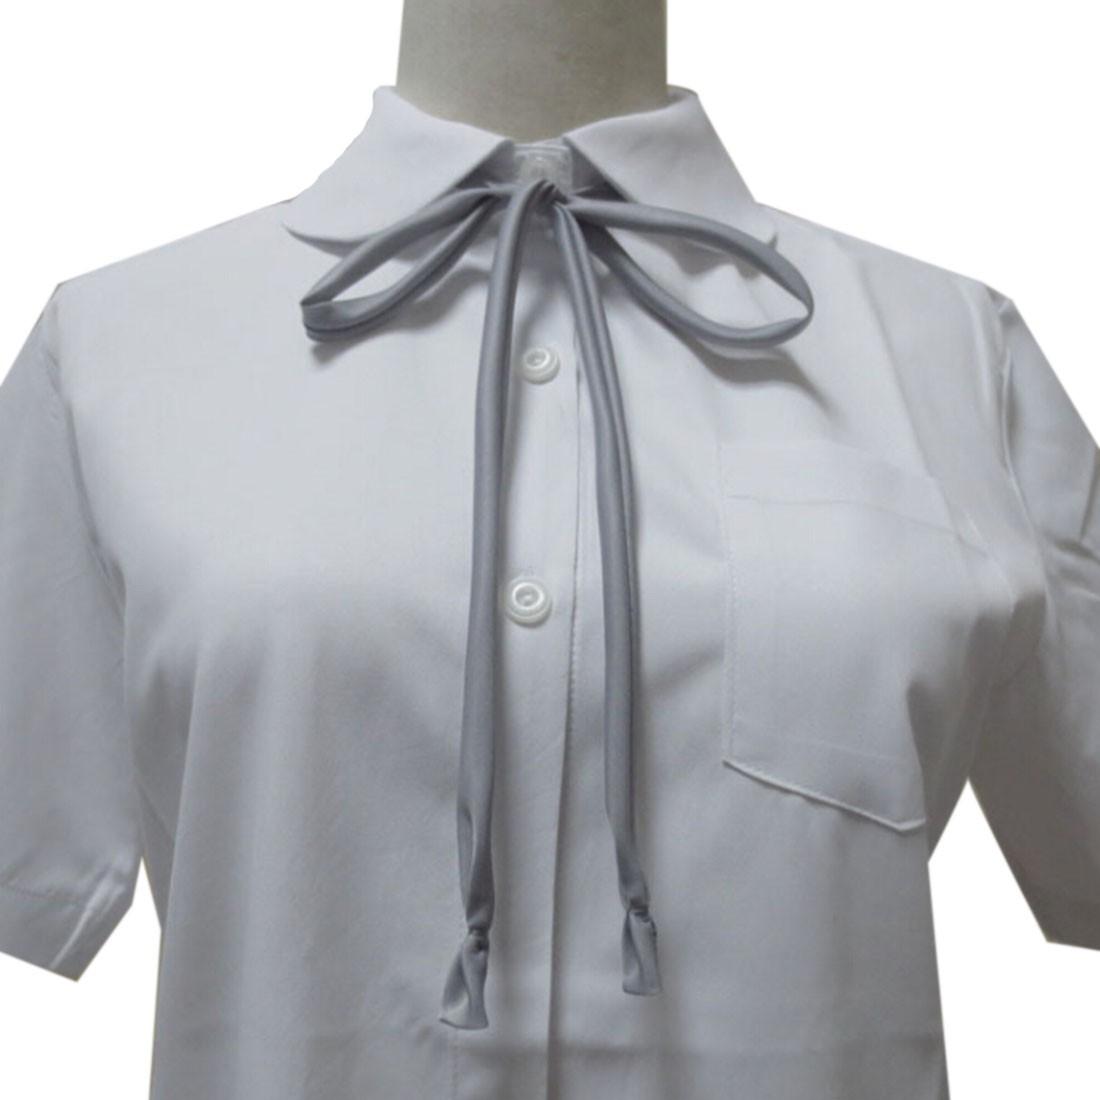 Student school uniform skinny bowknot bow tie for women girl japan student school uniform skinny bowknot bow tie for ccuart Choice Image